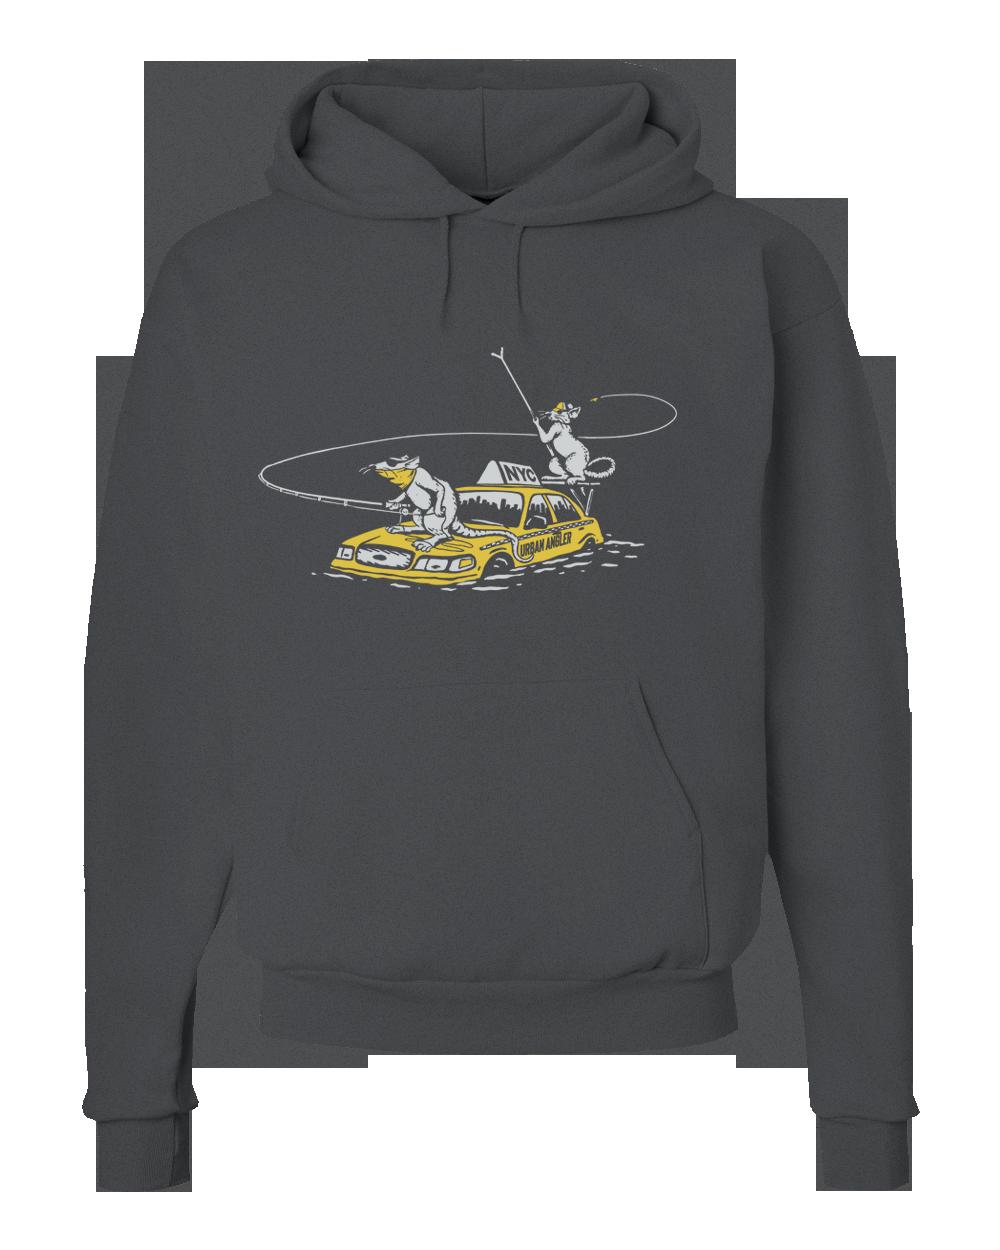 Urban Angler Shop Rats Logo Hoody